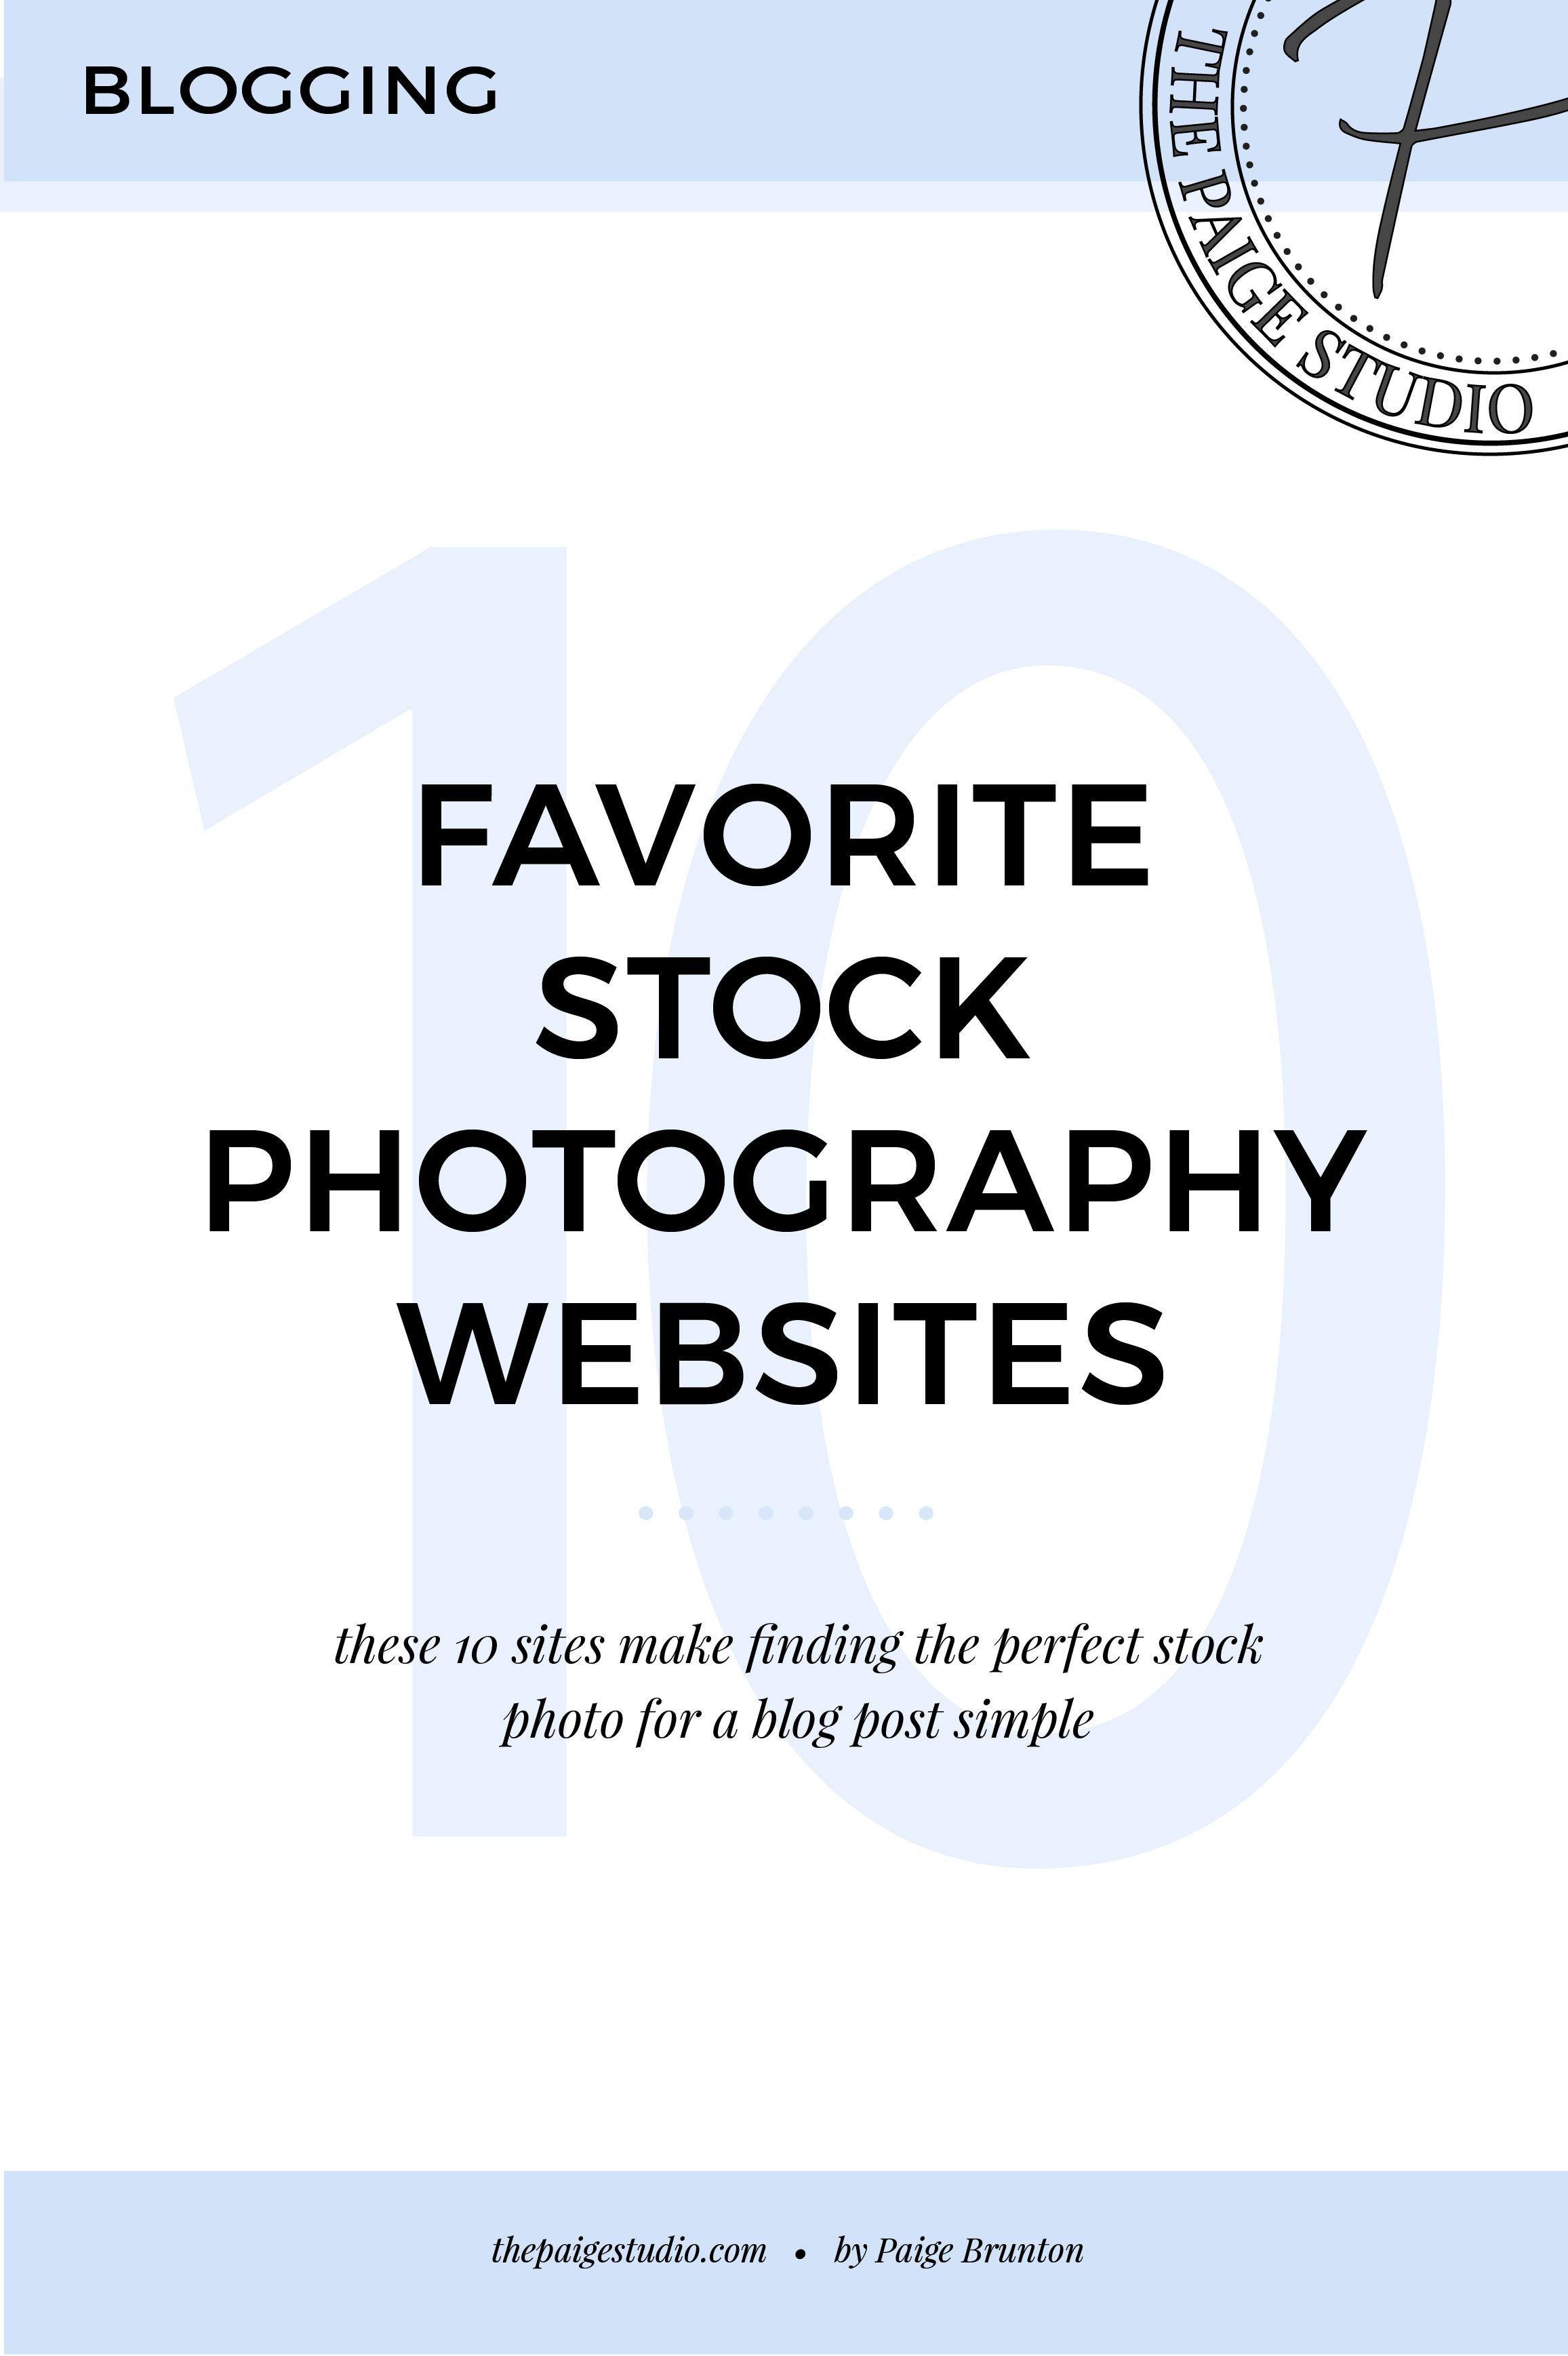 Saving For Later: 10 Guaranteed No-Fuss Stock Photography Websites